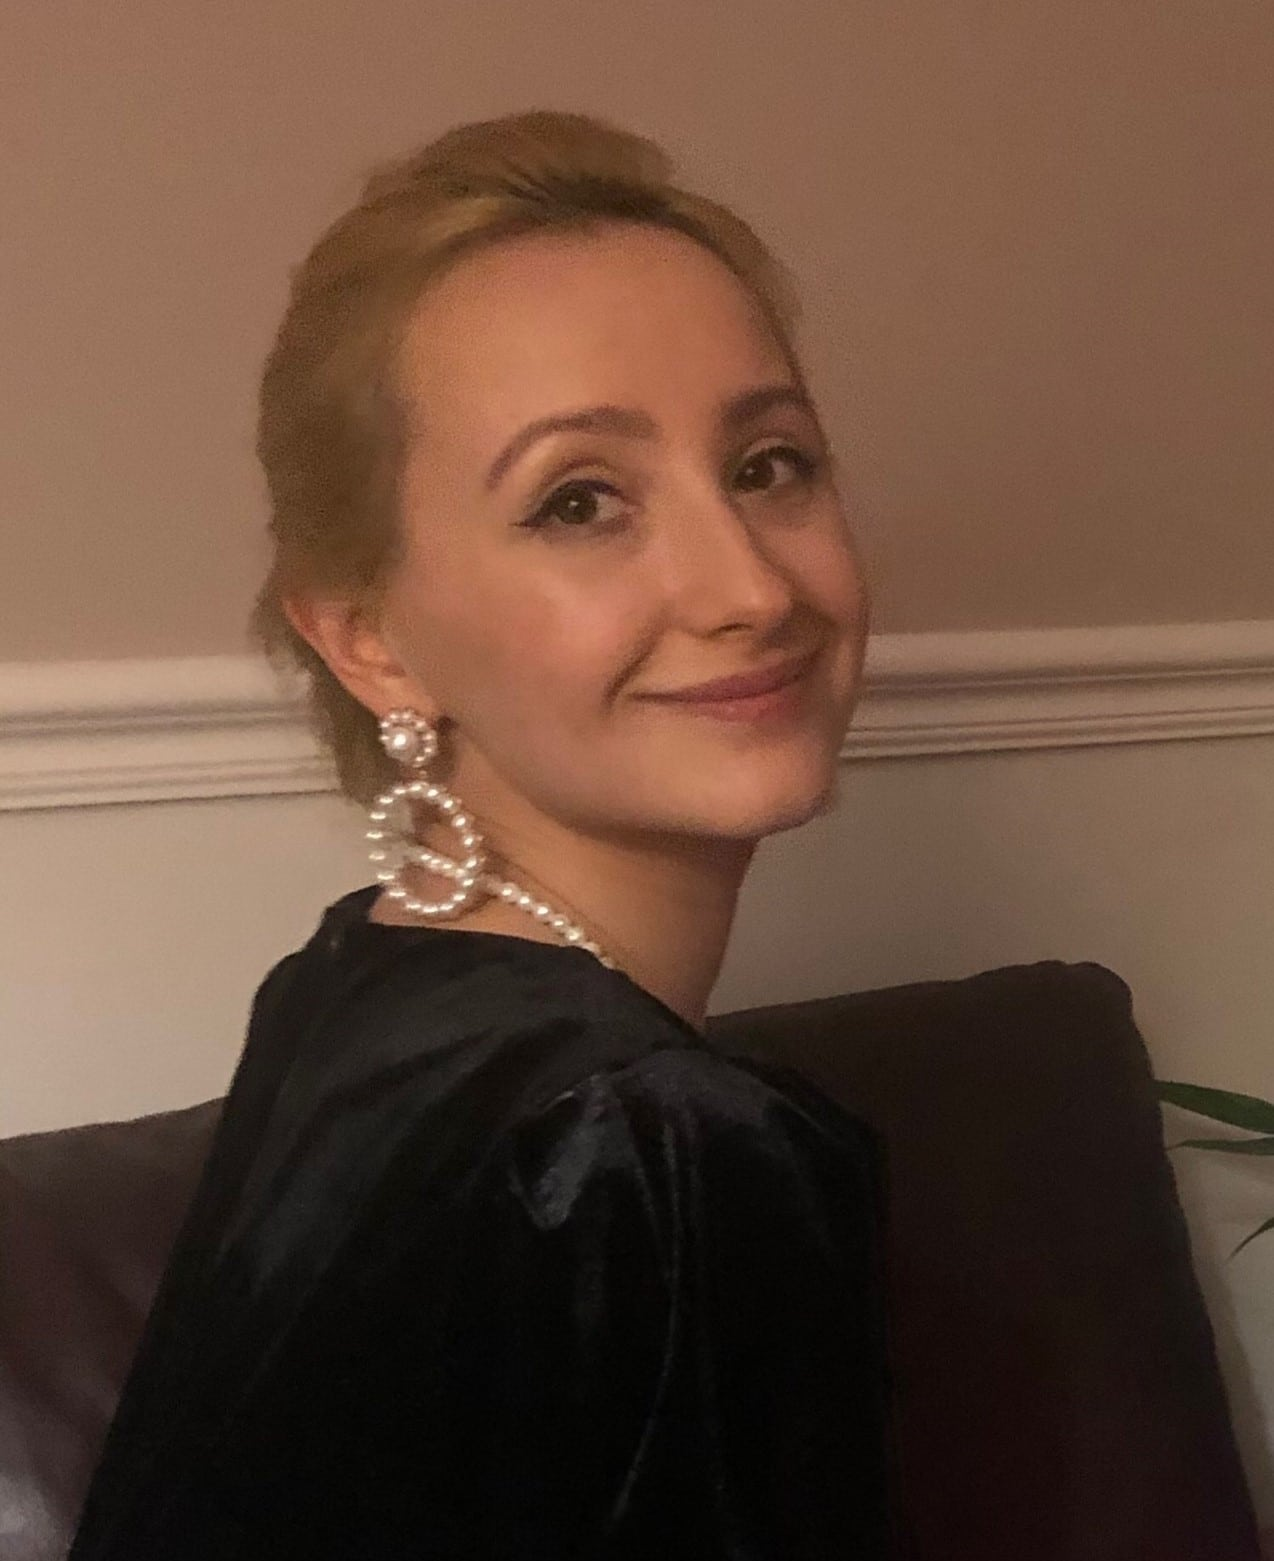 Kamila Tukhvatullina